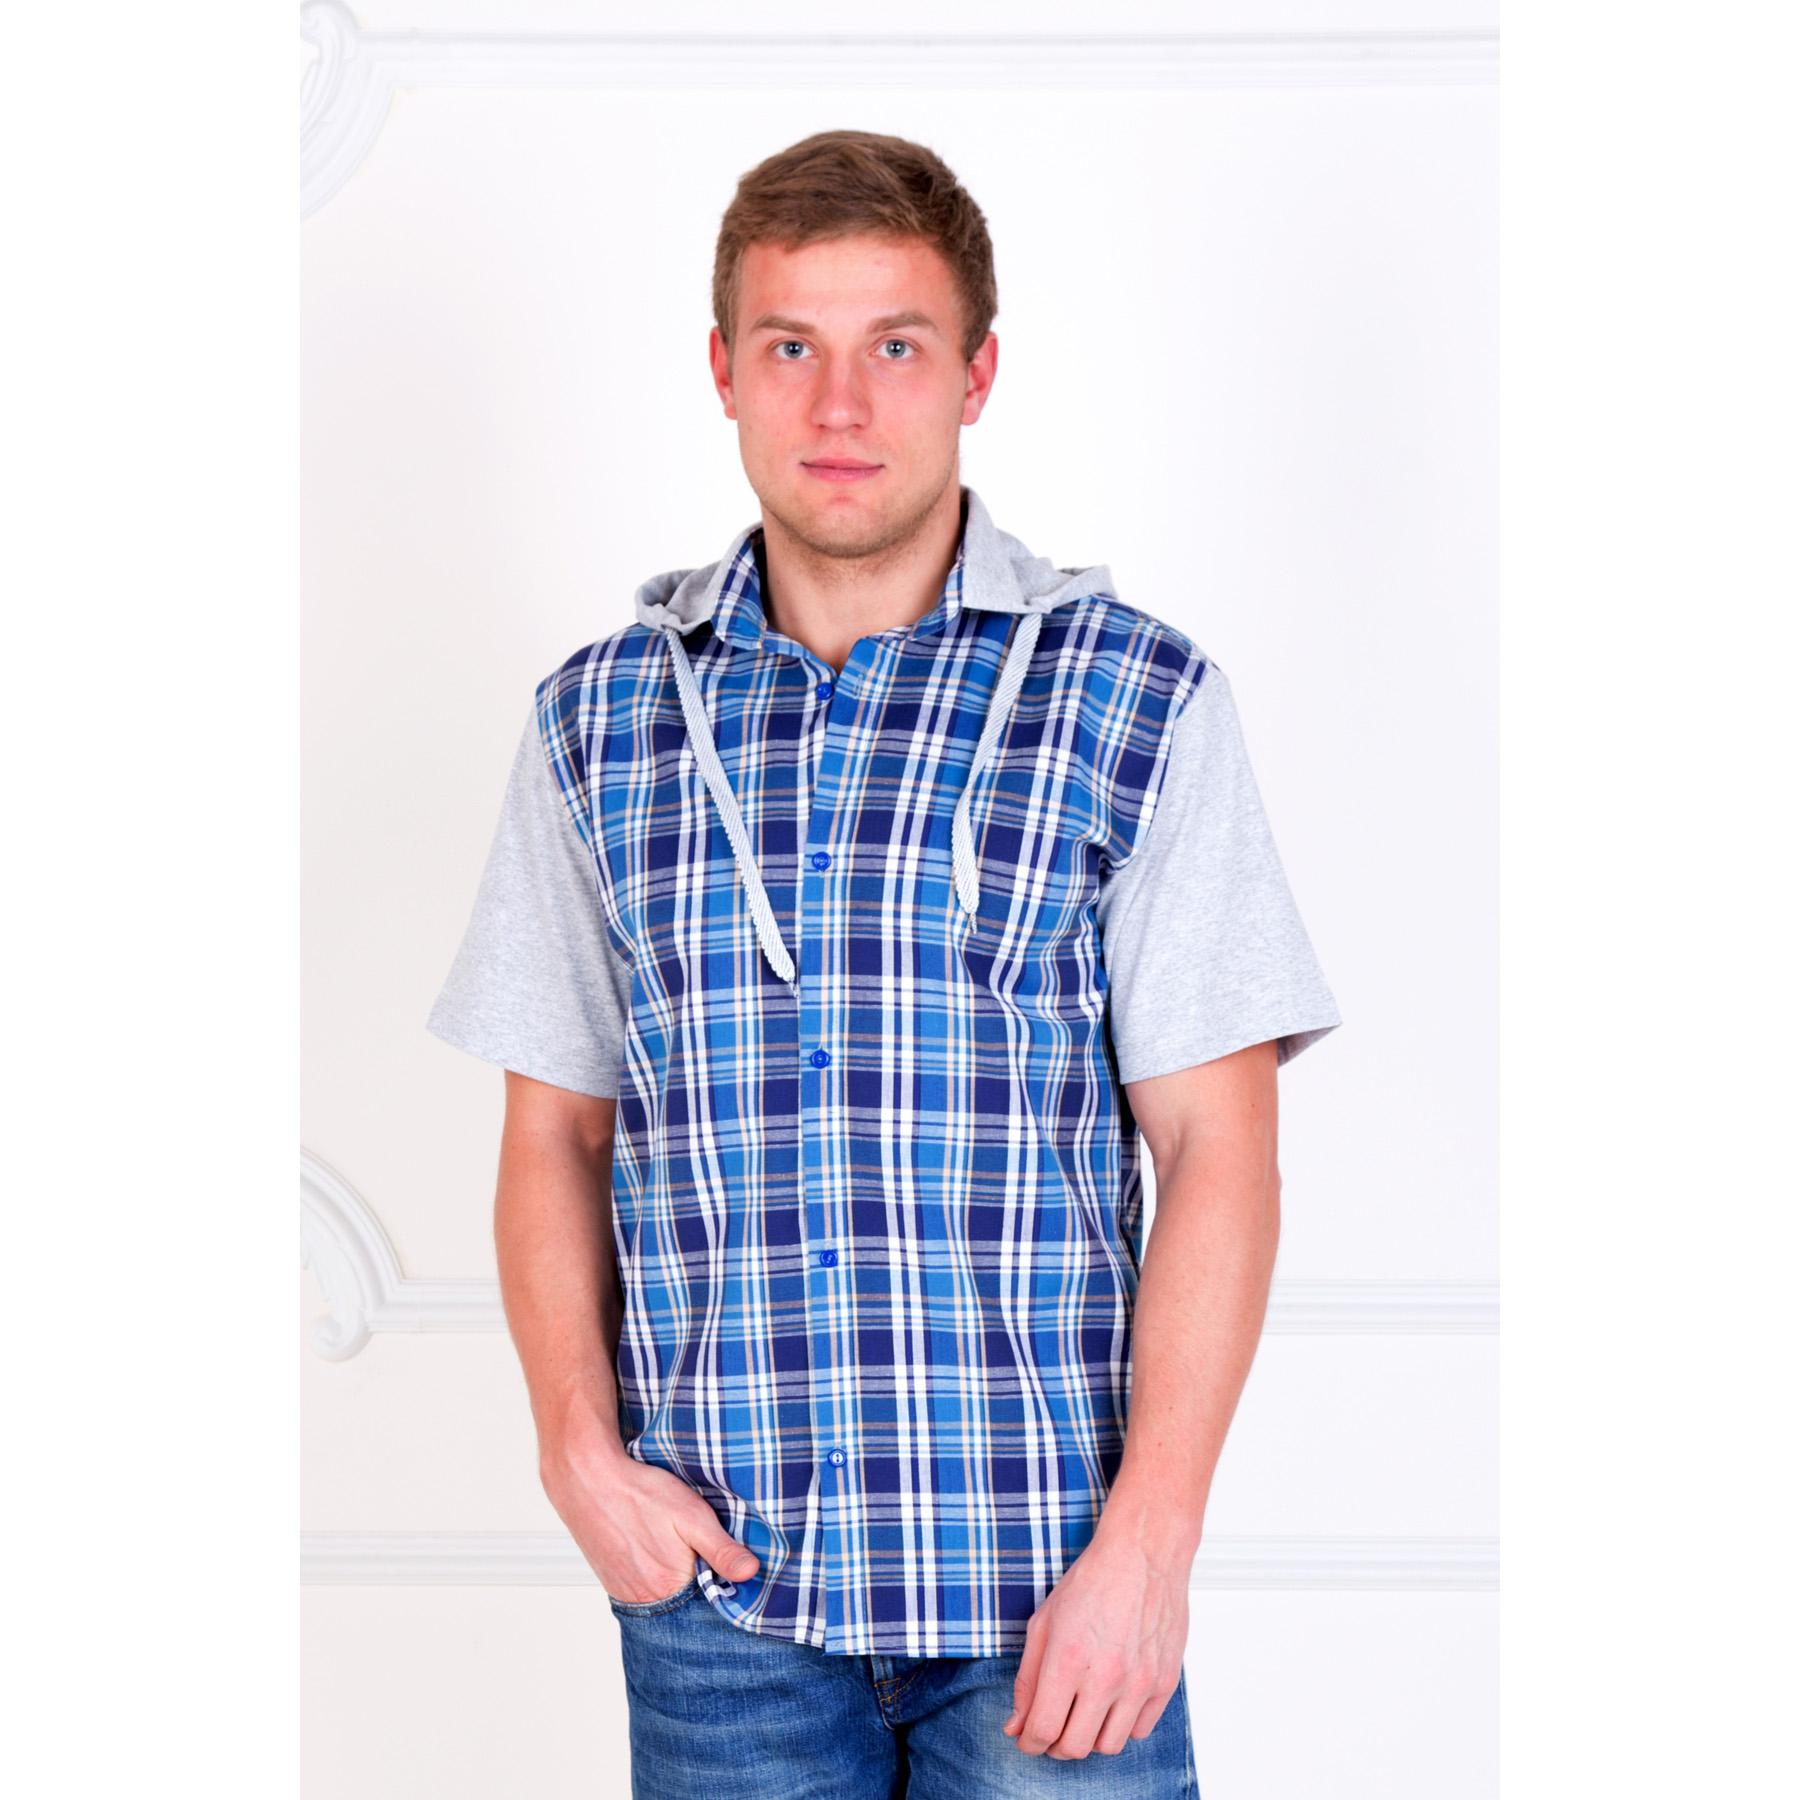 Мужская рубашка «Юстин» арт. 0031, размер 42Толстовки, джемпера и рубашки<br>Обхват груди:84 см<br>Обхват талии:84 см<br>Обхват бедер:88 см<br>Рост:170-176 см<br><br>Тип: Муж. рубашка<br>Размер: 42<br>Материал: Шотландка